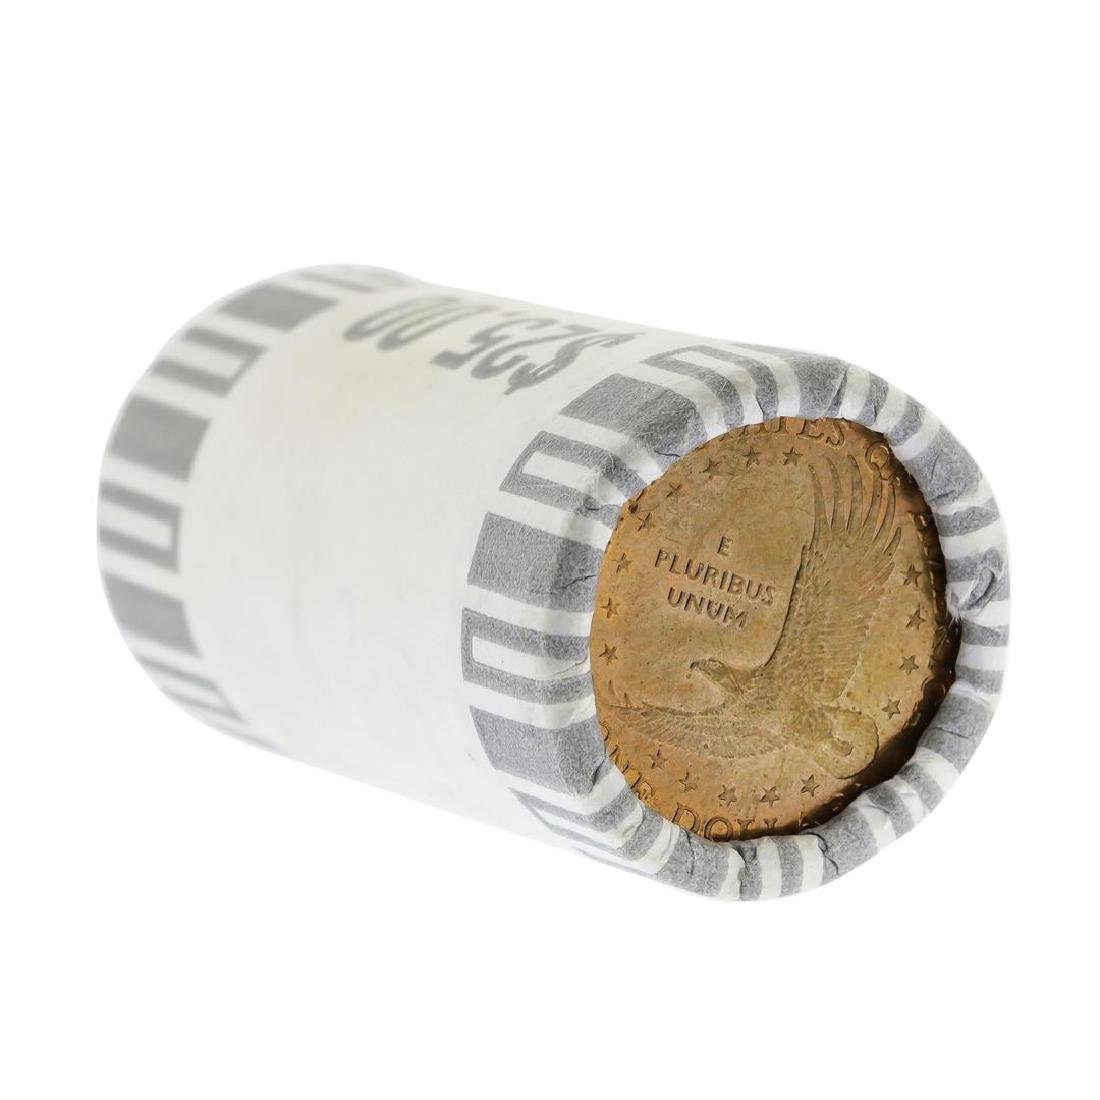 Roll of (25) 2000-P Sacagawea Dollar Coins - 3